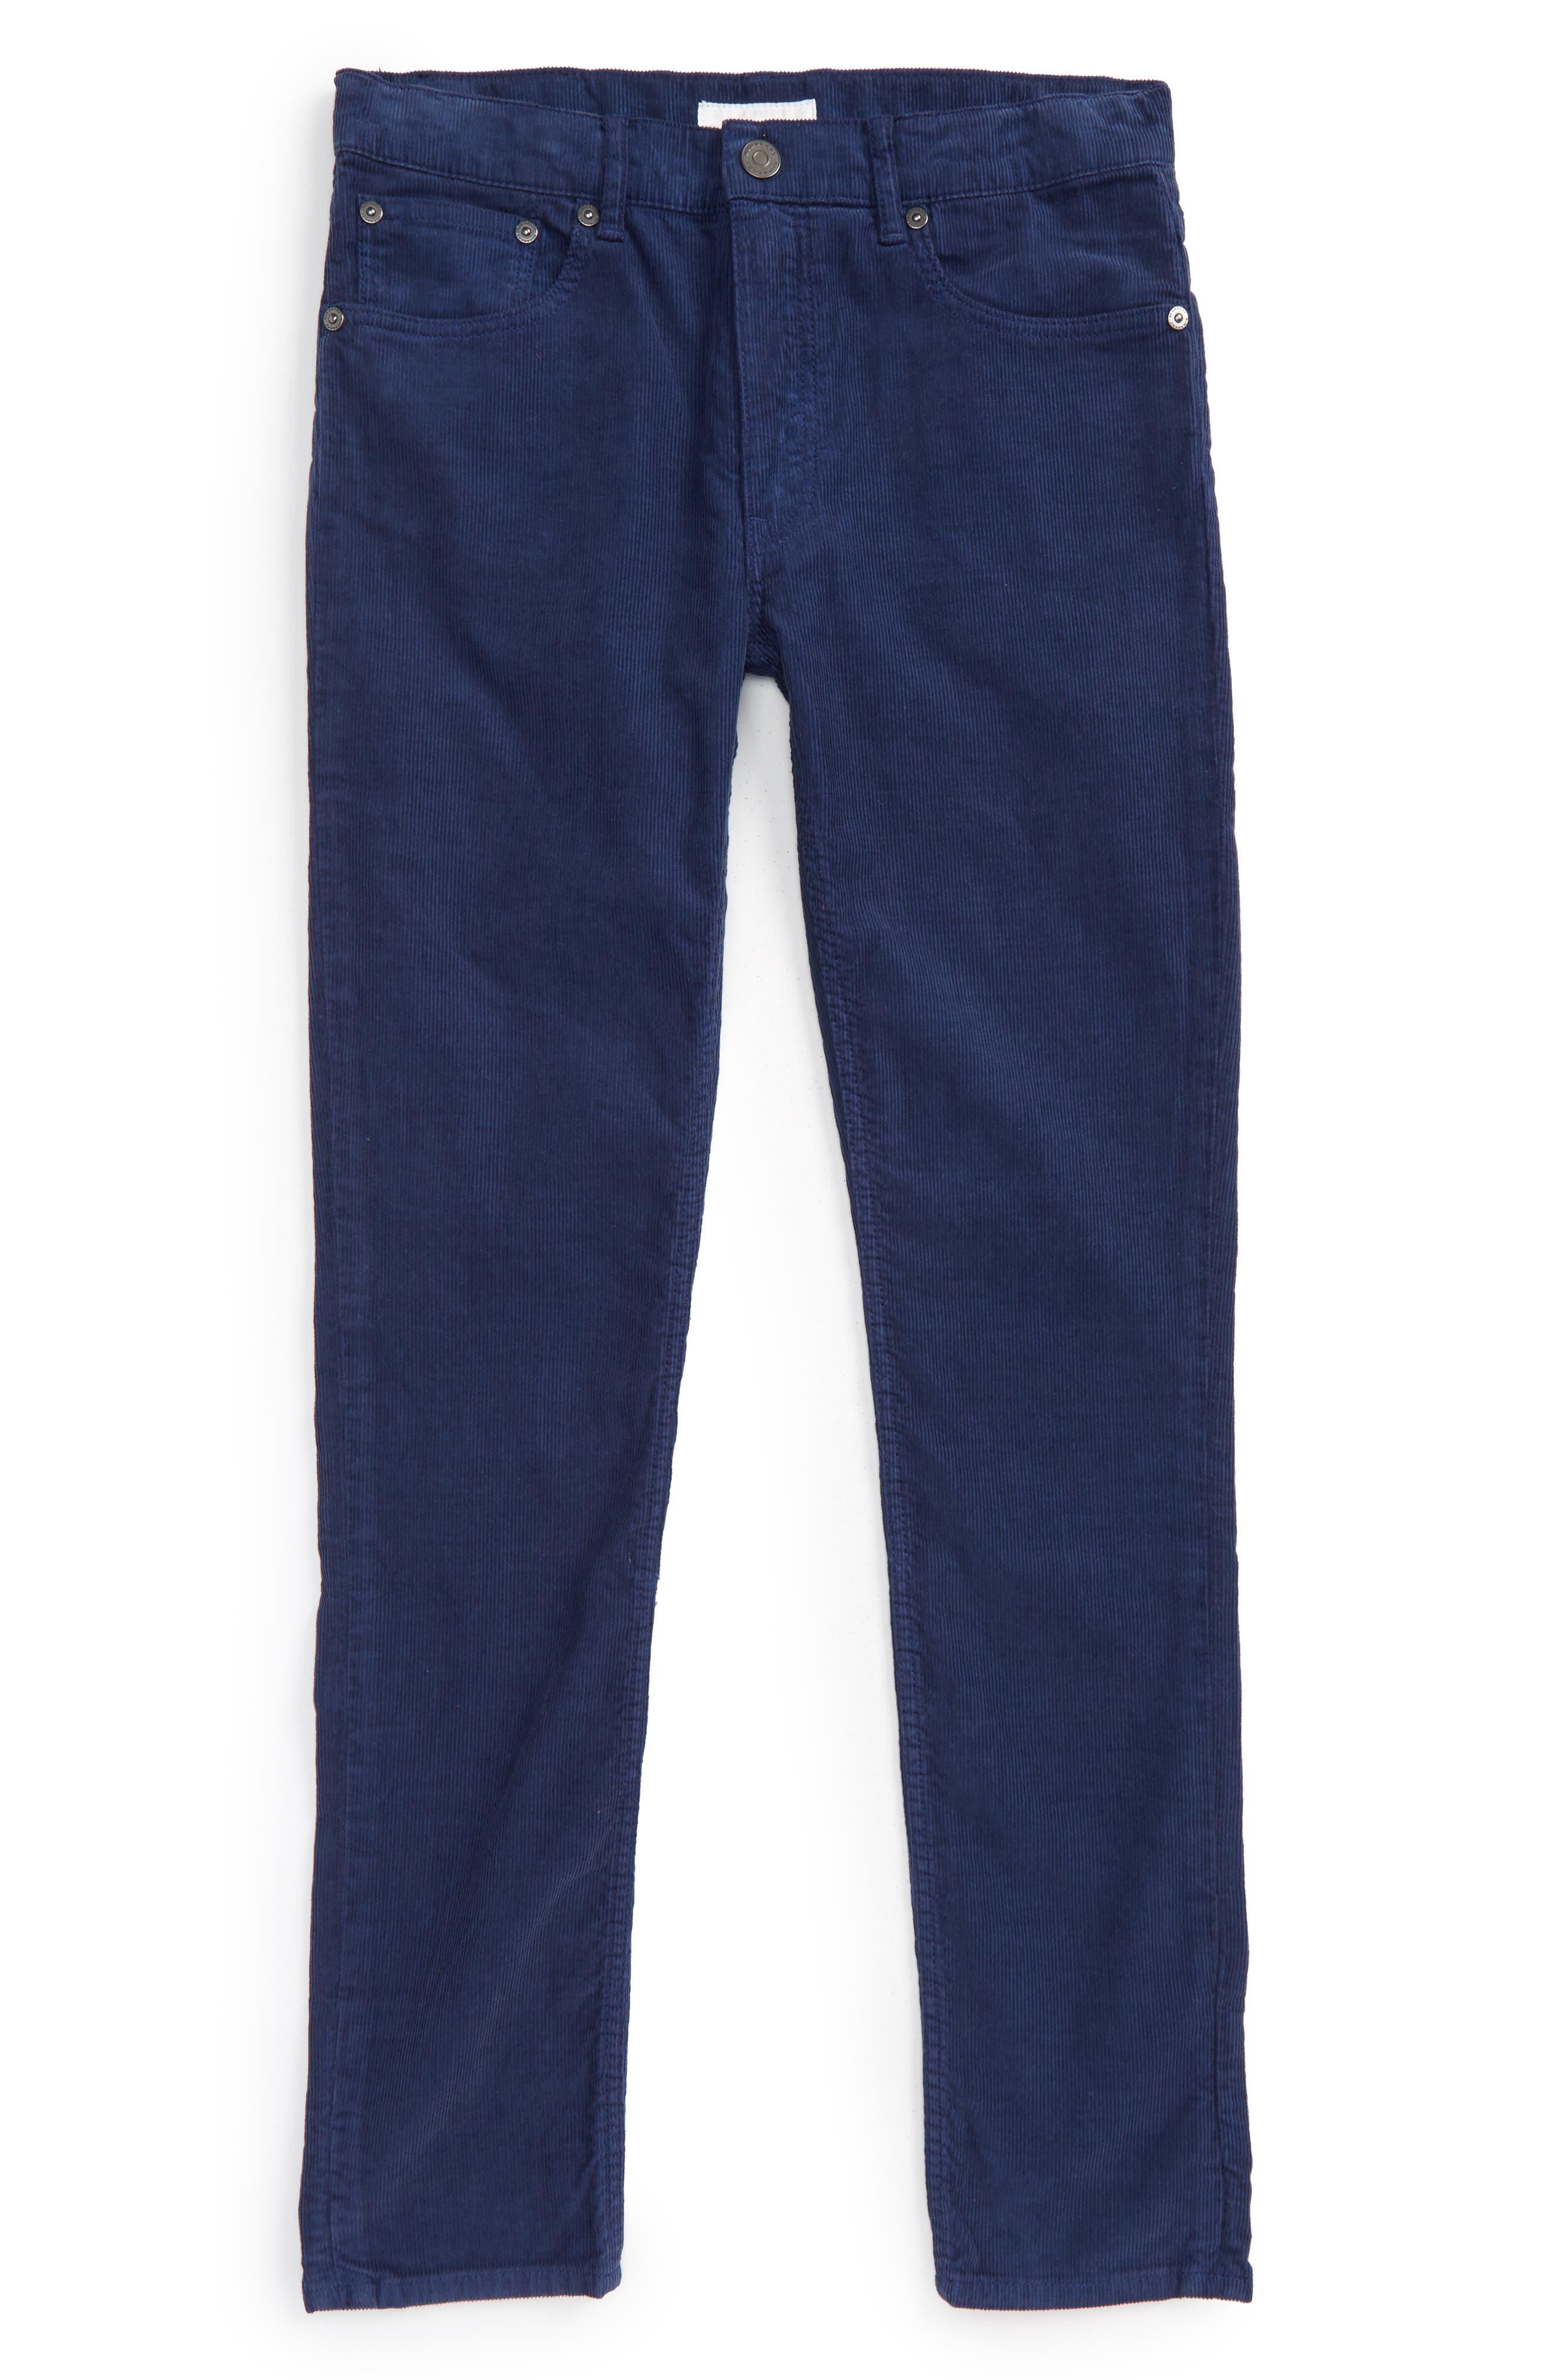 Burberry Corduroy Skinny Pants (Little Boys & Big Boys)